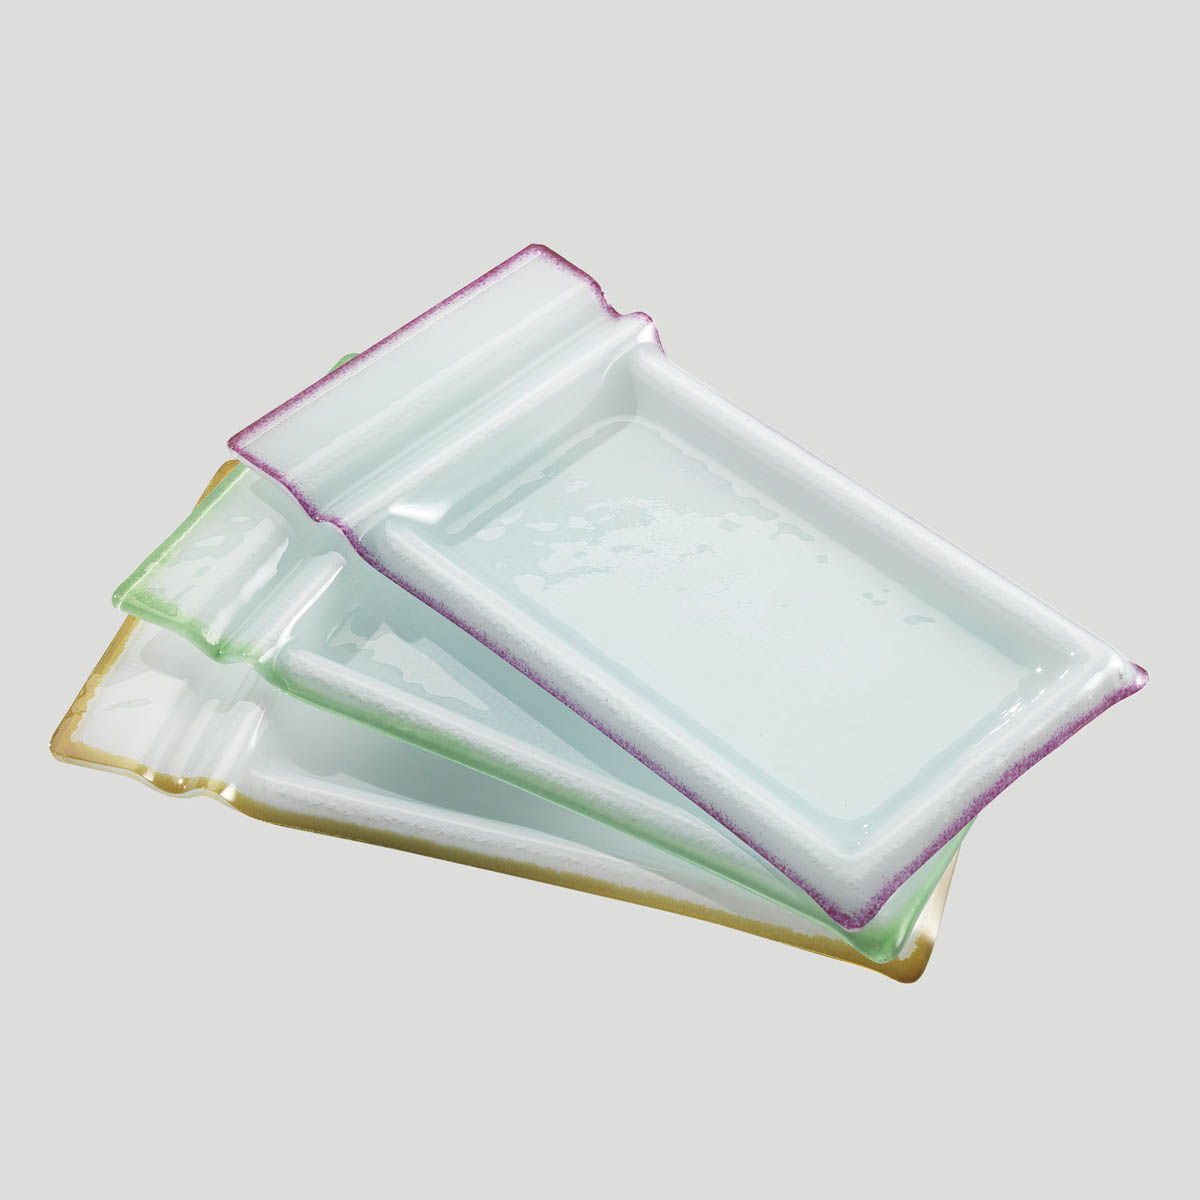 Tavoletta Dessert - piatto in vetro per dessert snack - Gardagel